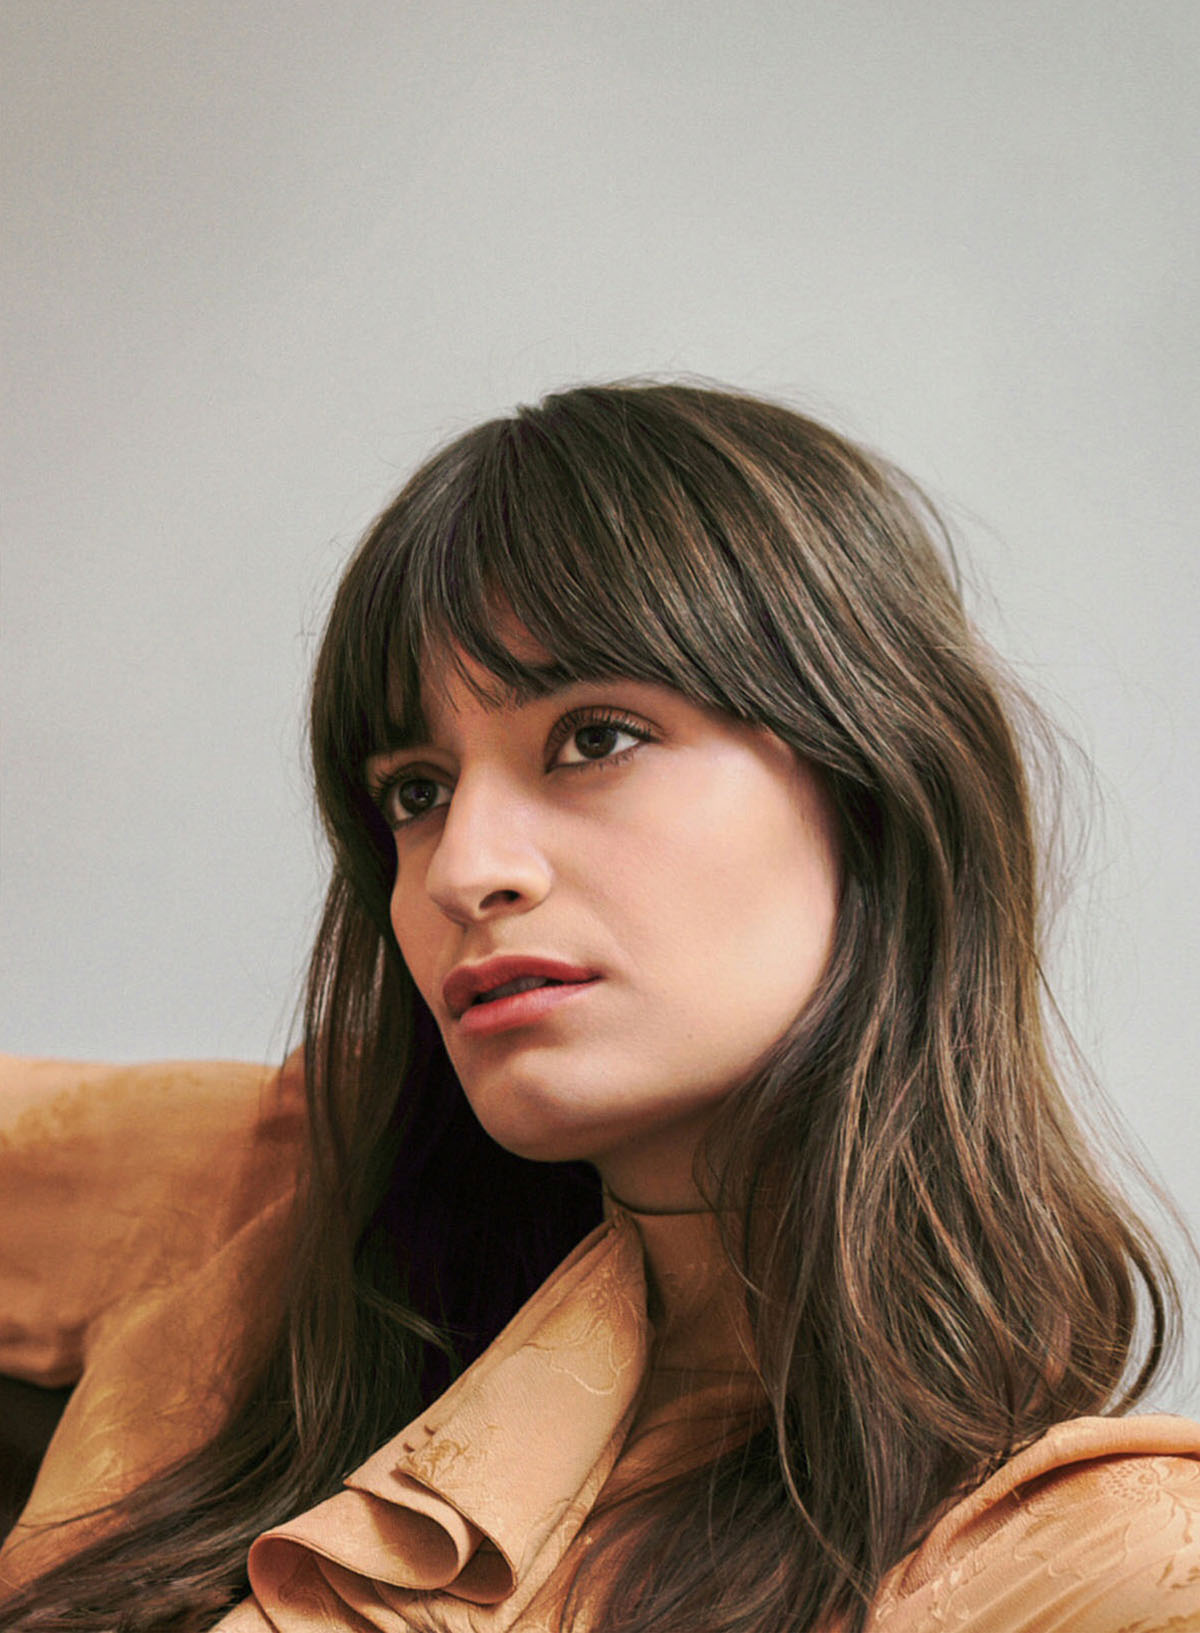 Clara Luciani covers Vanity Fair France July 2021 by Joan Braun